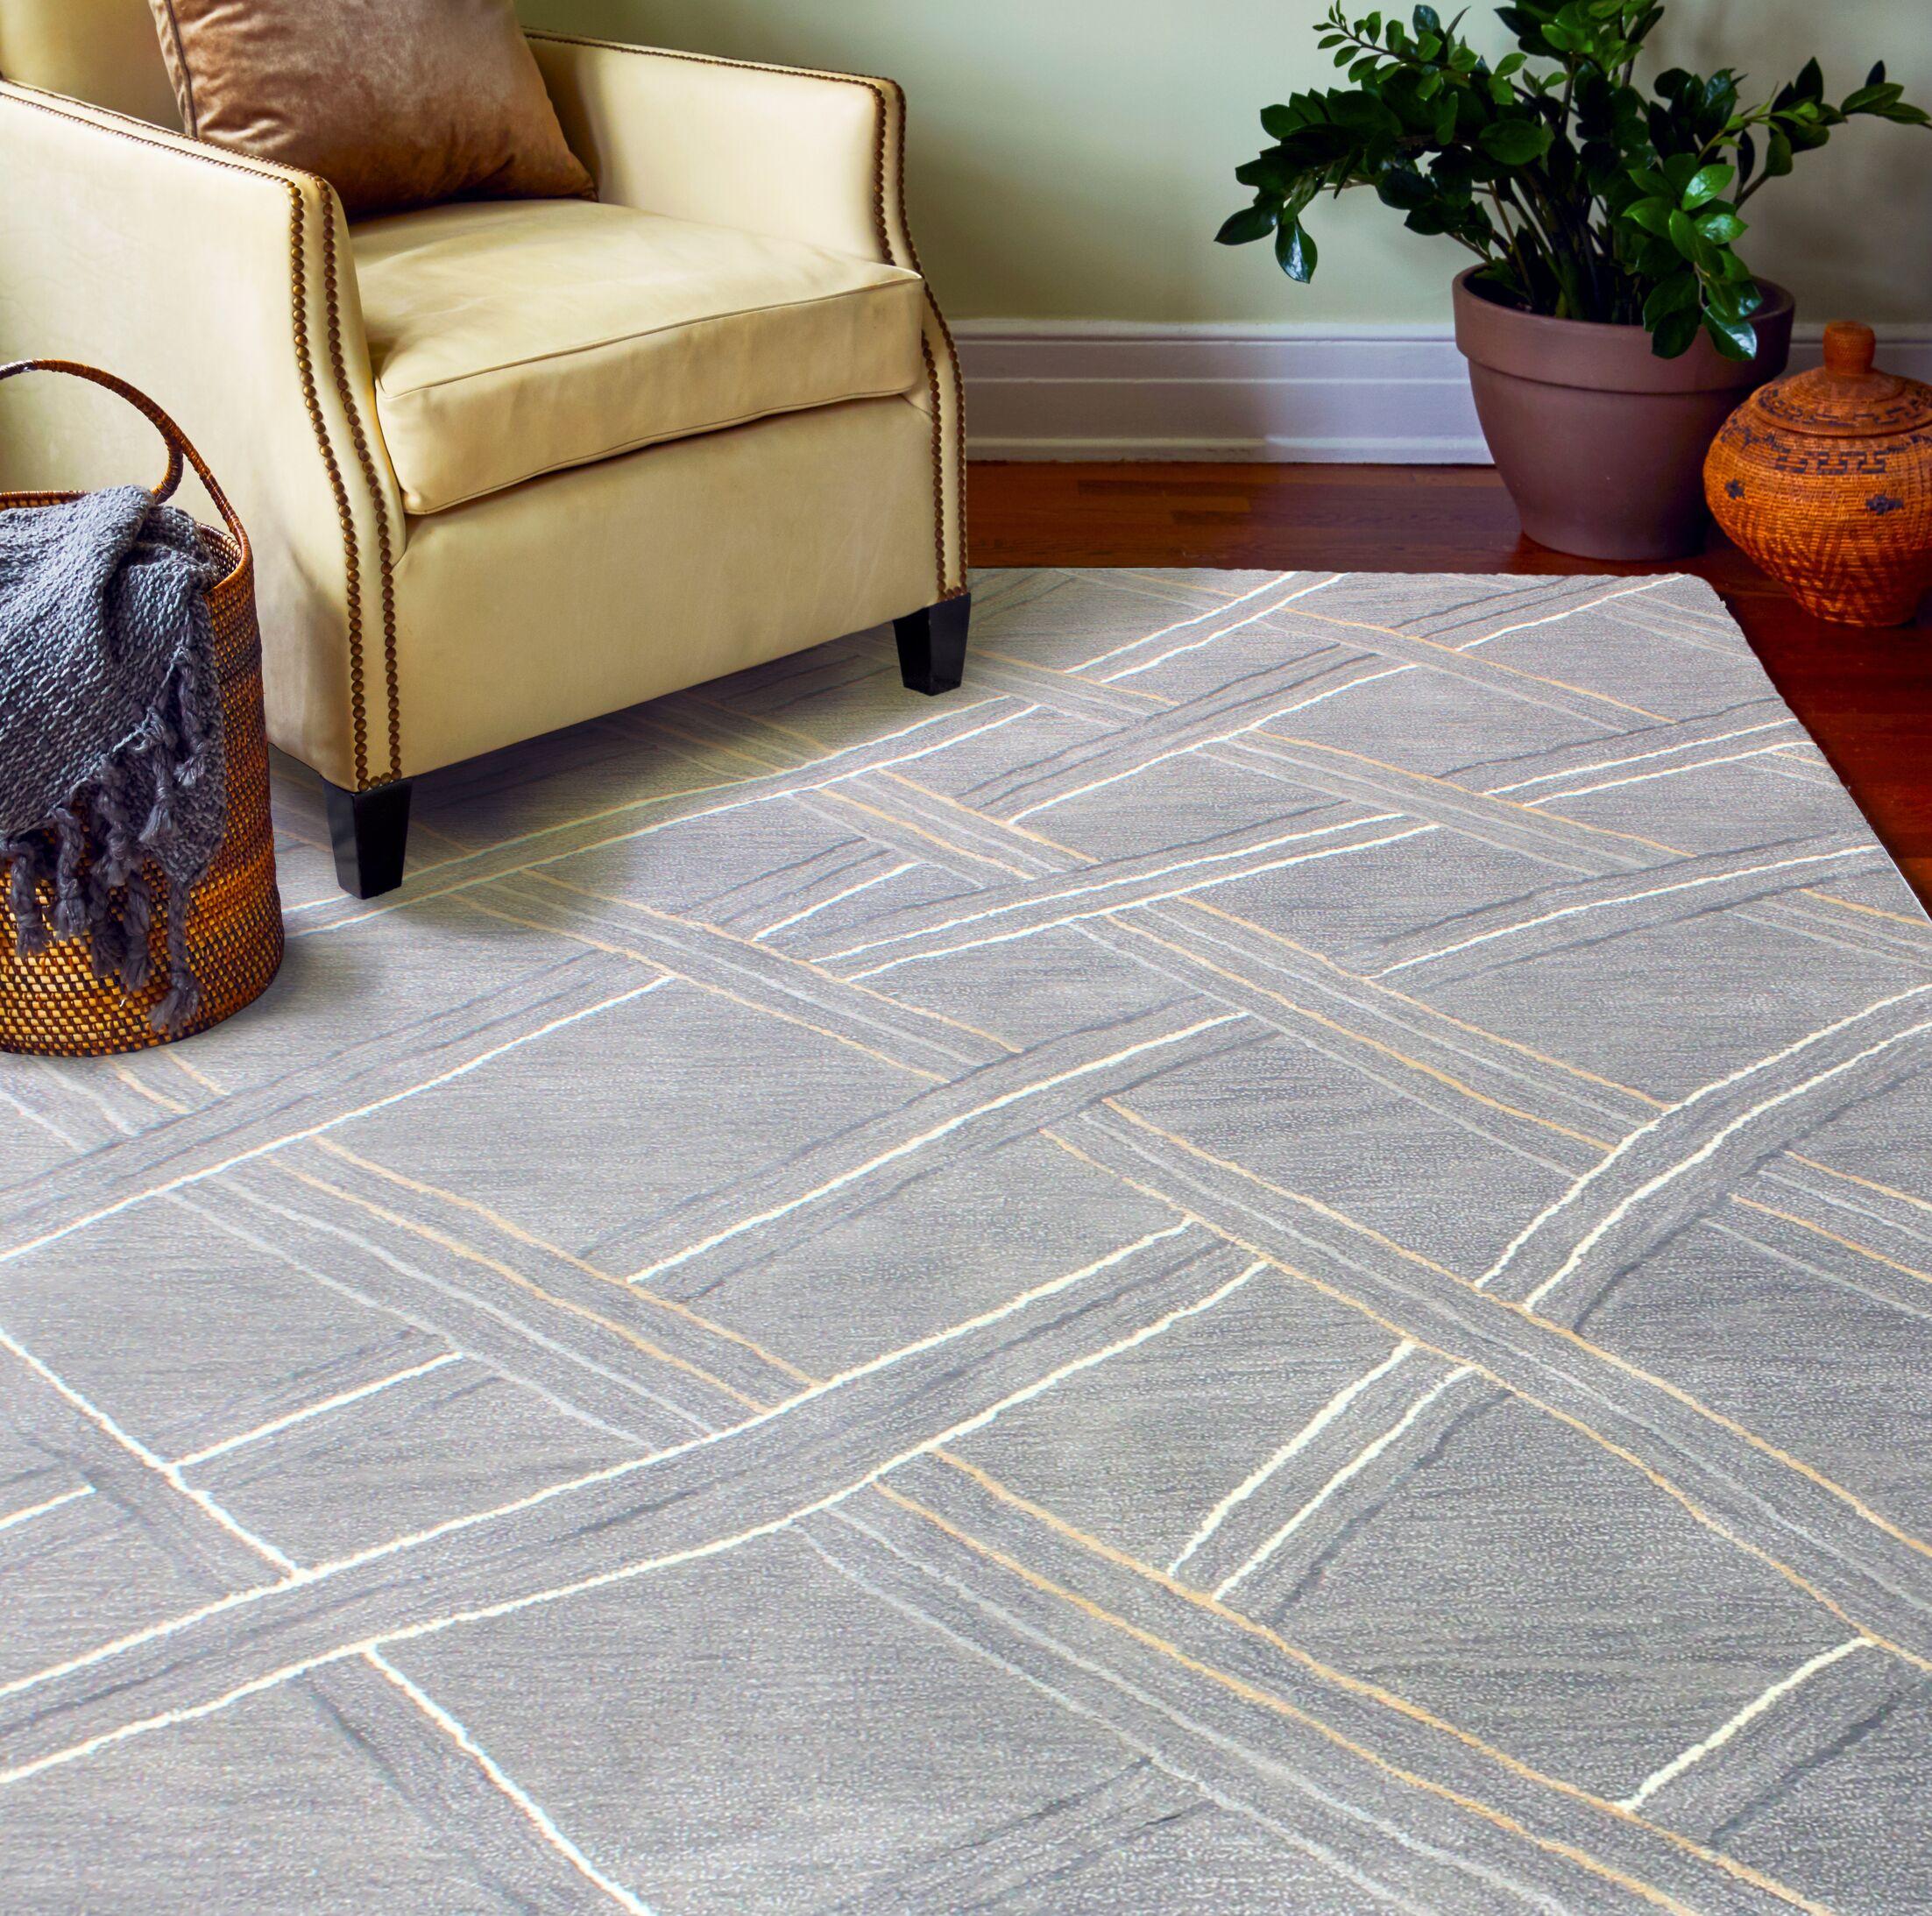 Pearl Street Artsilk Hand-Woven Wool Gray Area Rug Rug Size: Rectangle 5'6